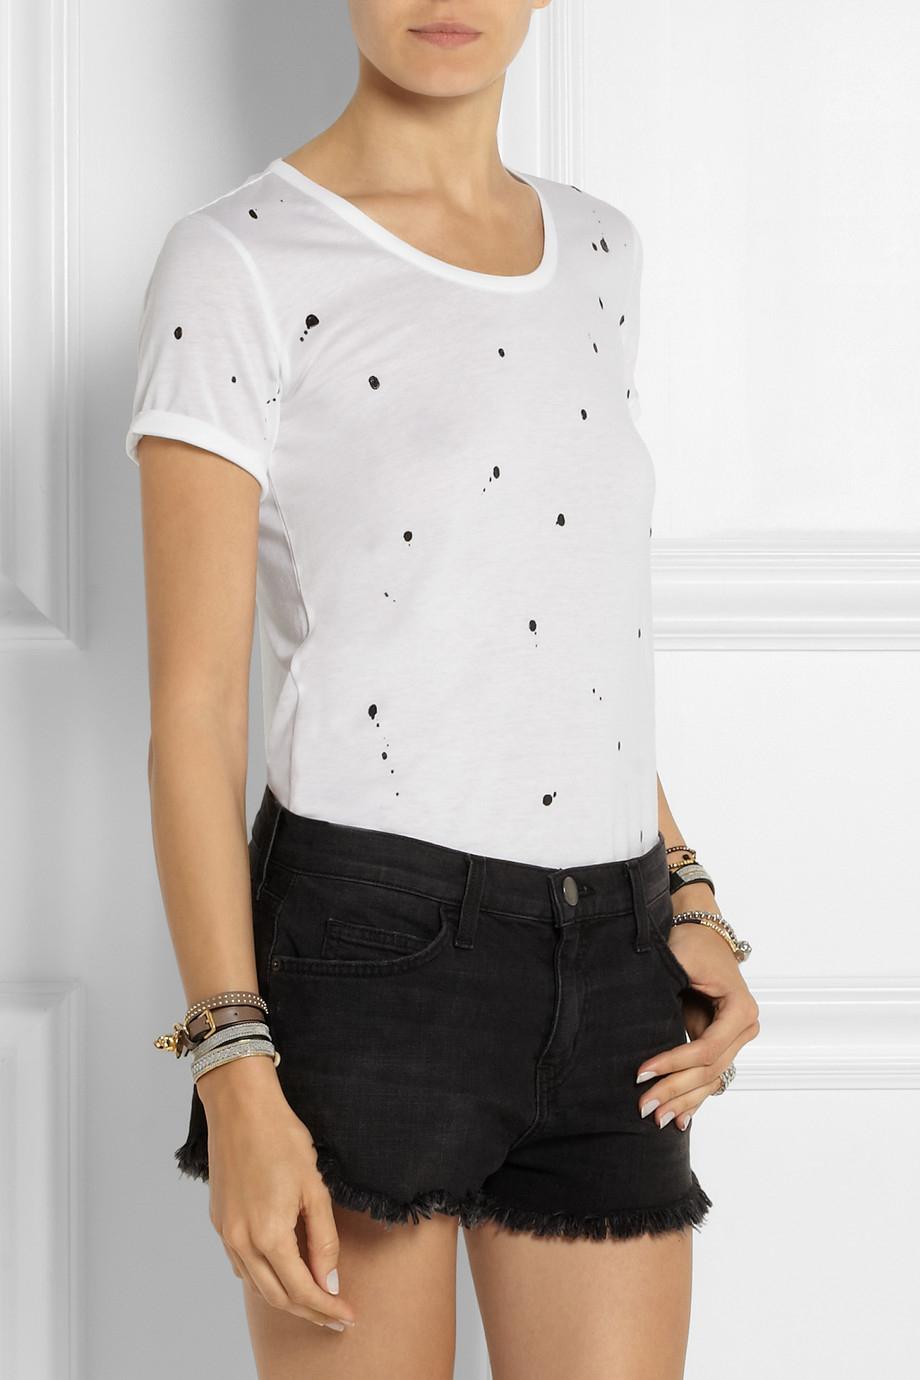 Rag bone splatter paint appliqu d jersey t shirt in for Rag and bone white t shirt